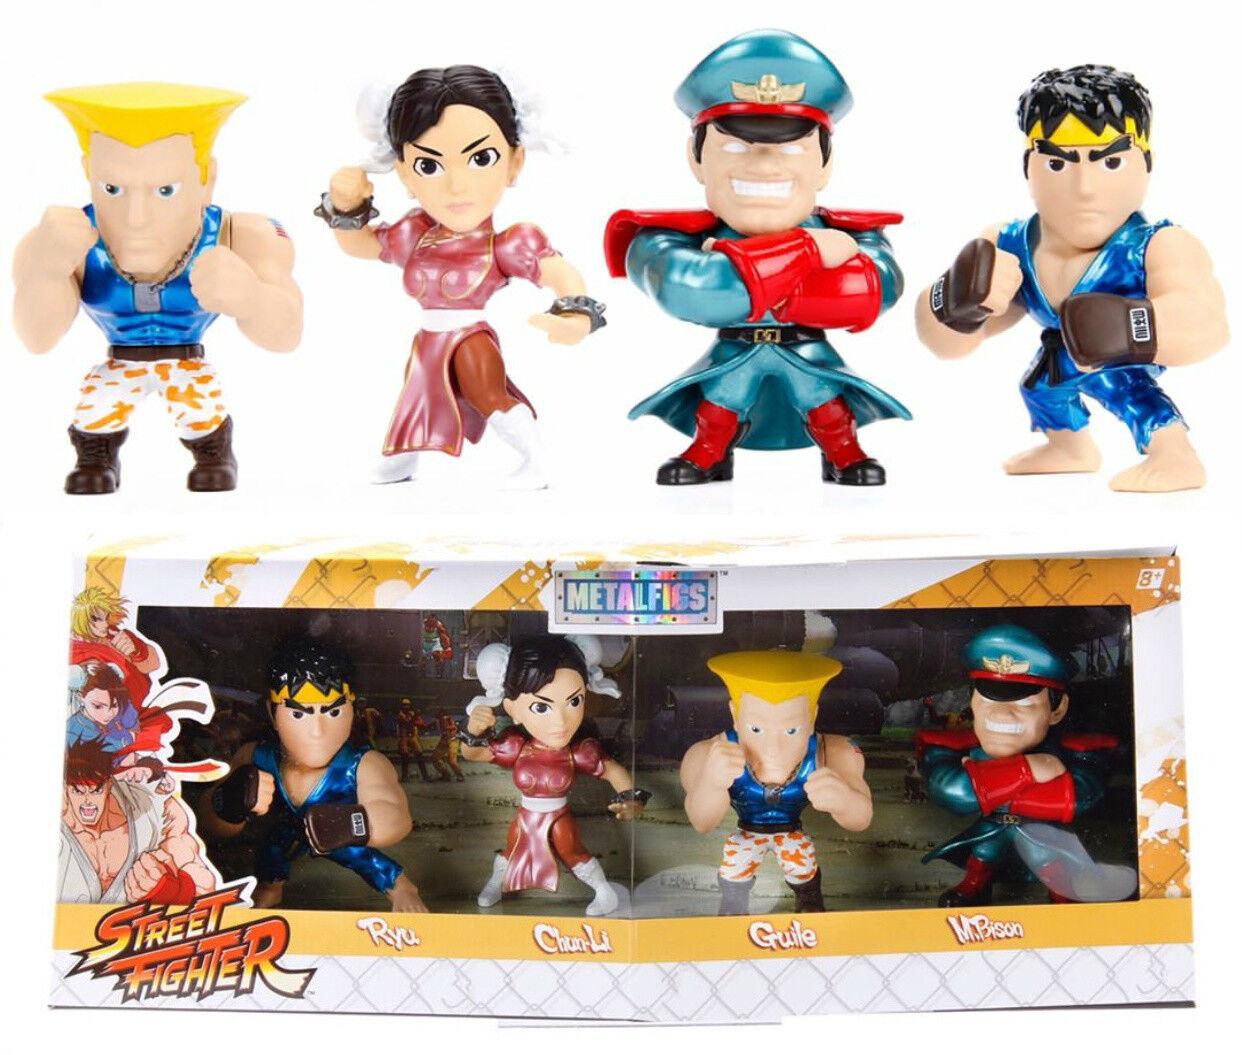 Jada Metals 4 4 4  Die Cast Capcom Street Fighter Bundle Set Anime Expo Exclusive LE 218fab